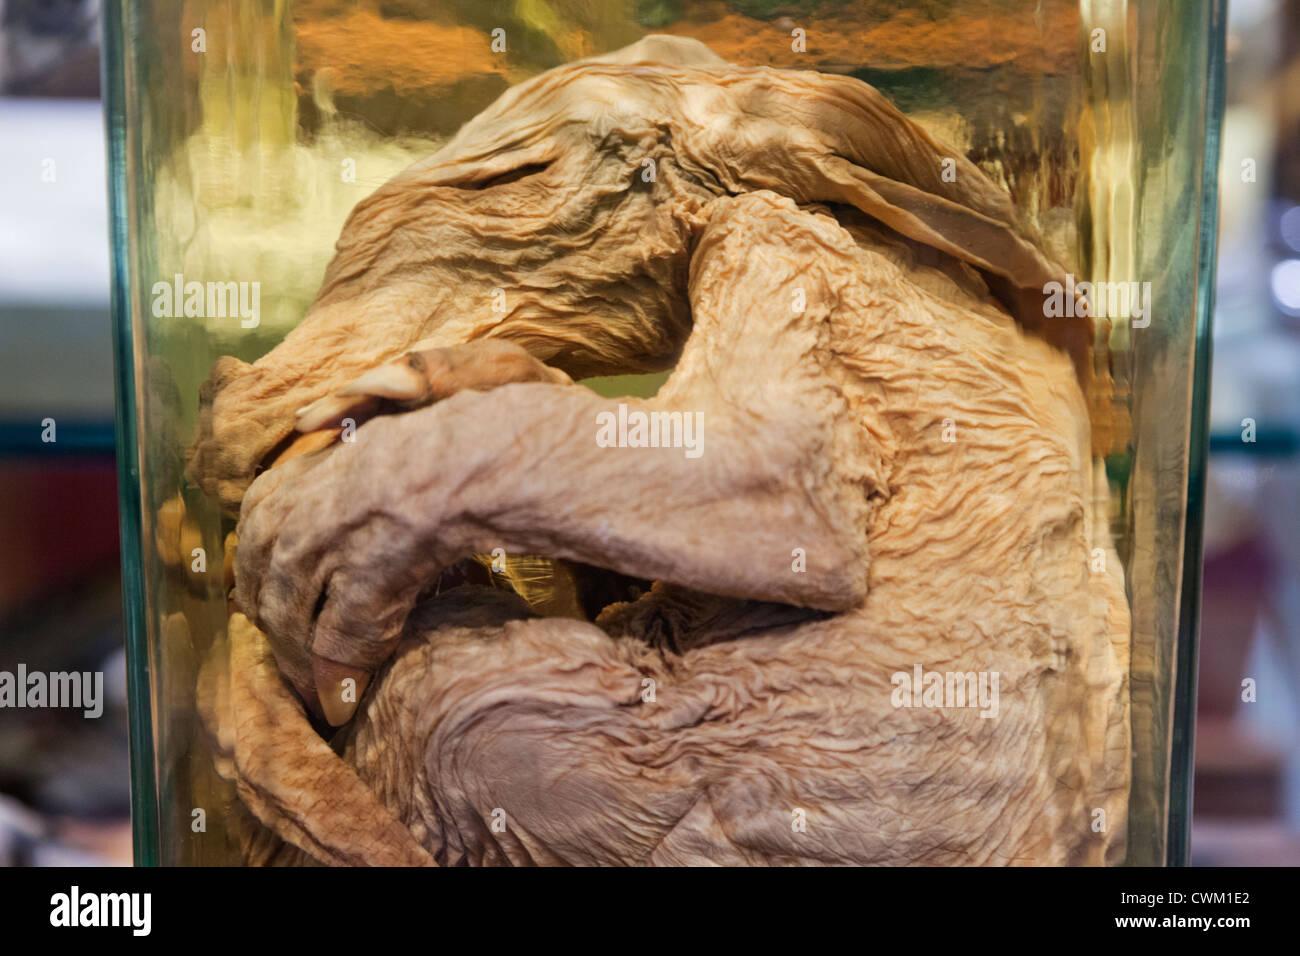 England, London, University College London, The Grant Museum of Zoology, Infant Aardvark - Stock Image